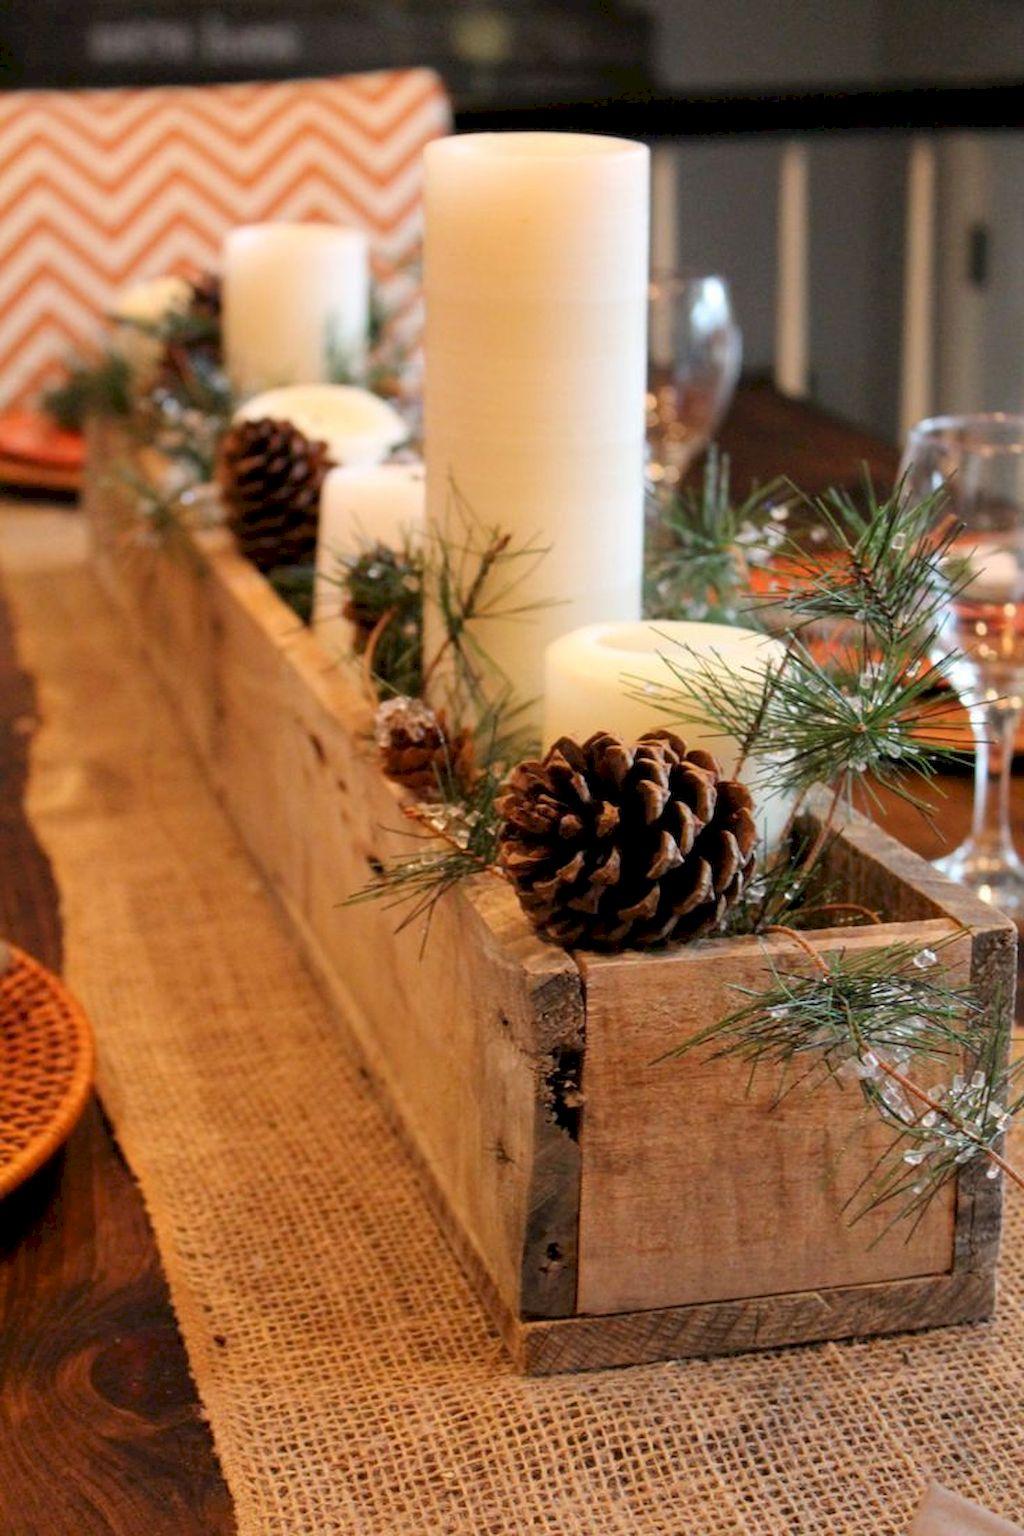 Ravishing Christmas Tree Decoration To Impress Your Guess